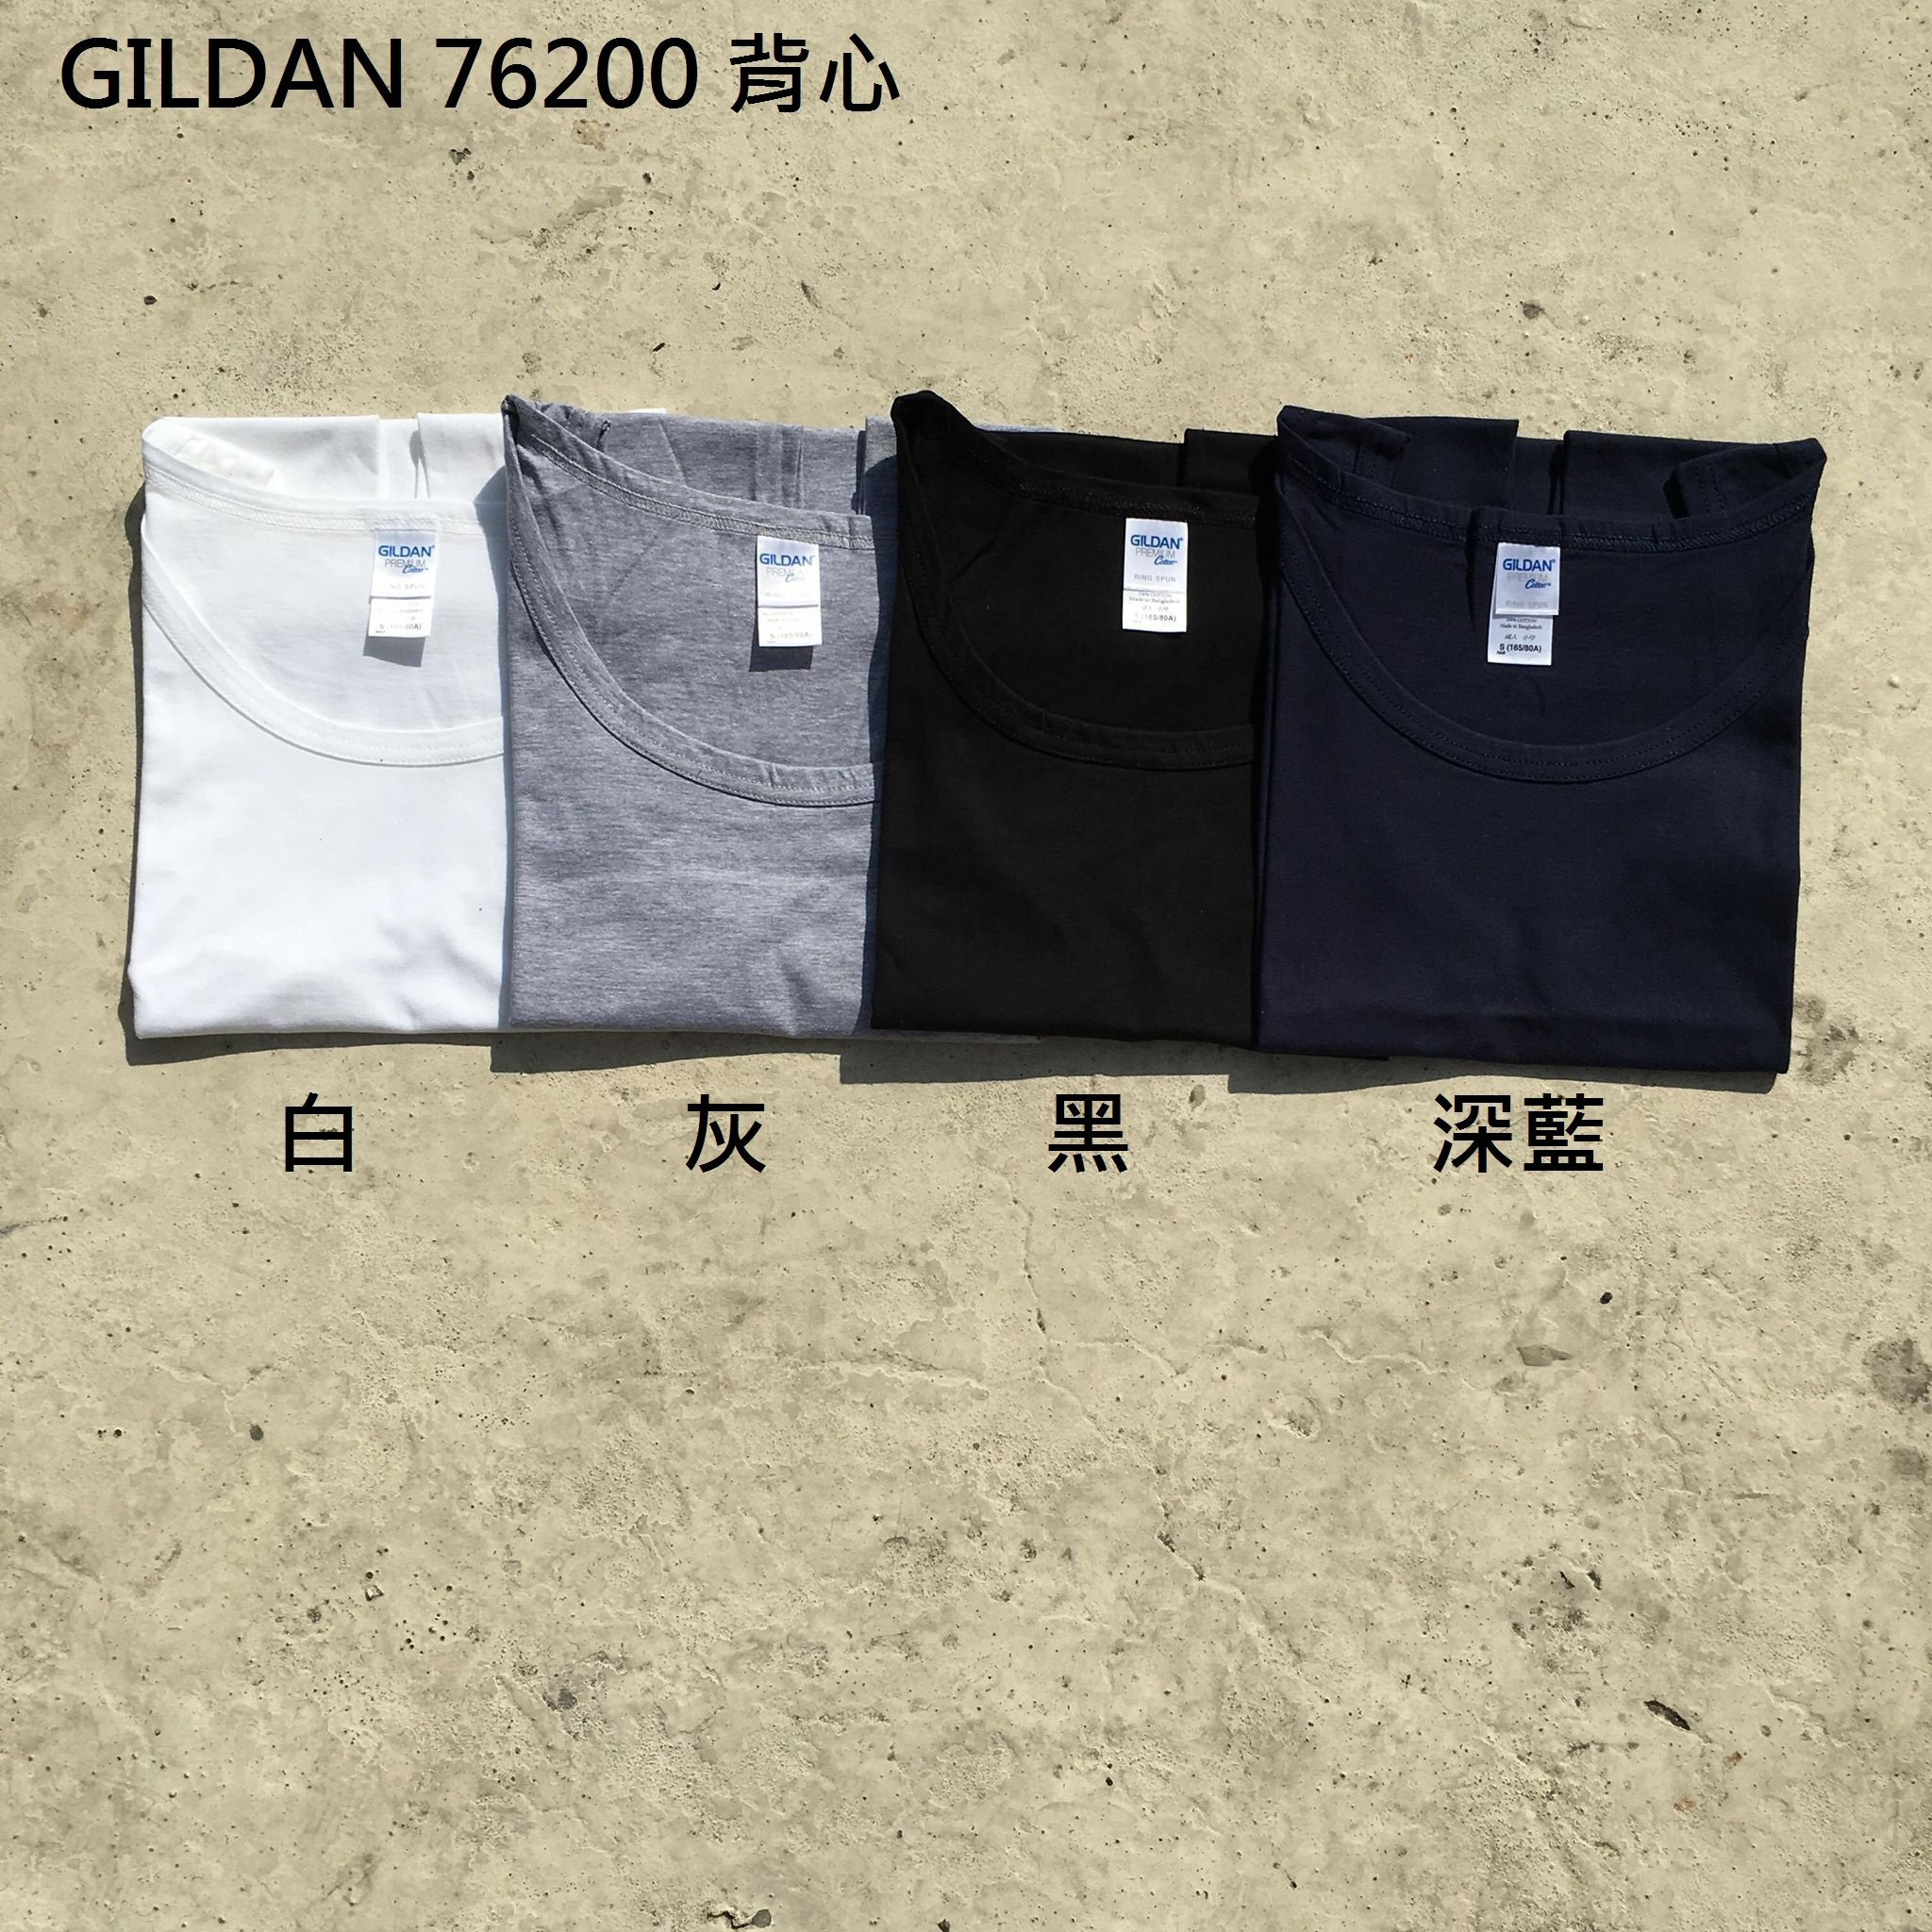 【HOMIEZ】台灣公司貨 吉爾登 GILDAN 76200 美國 背心 素面【76200】 美國棉 2XL 4色